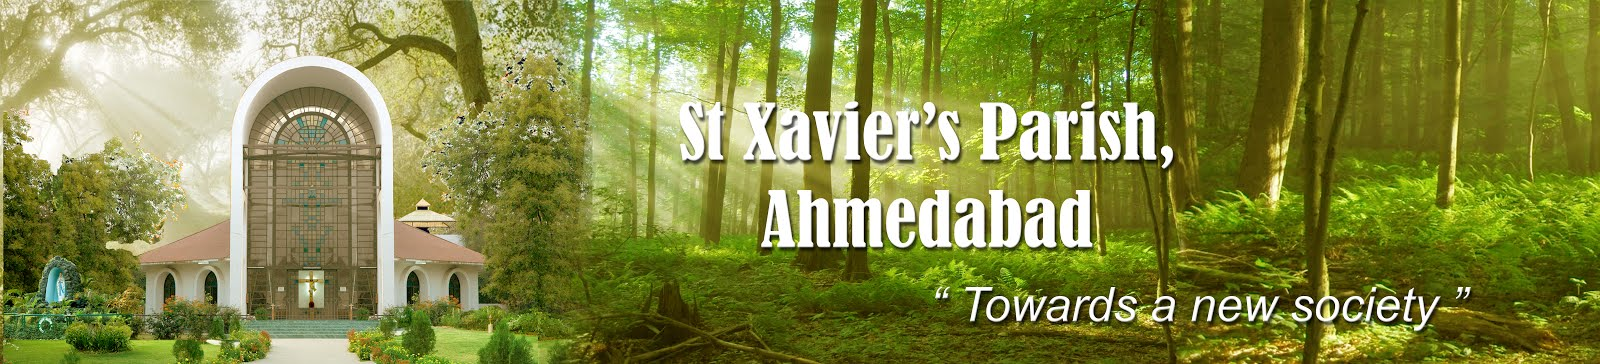 St Xavier's Parish, Ahmedabad